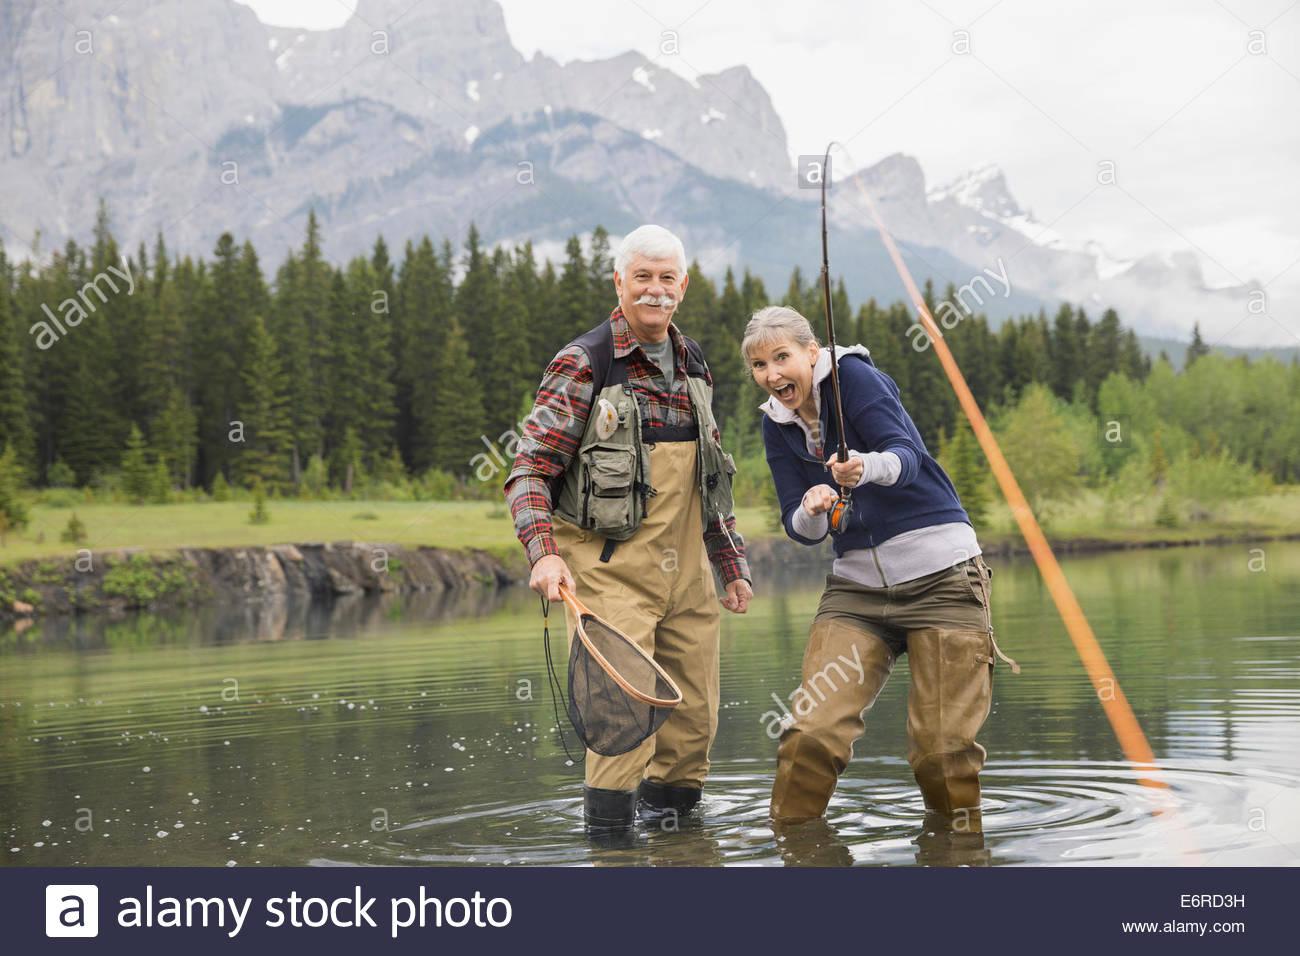 Older couple fishing in still lake - Stock Image